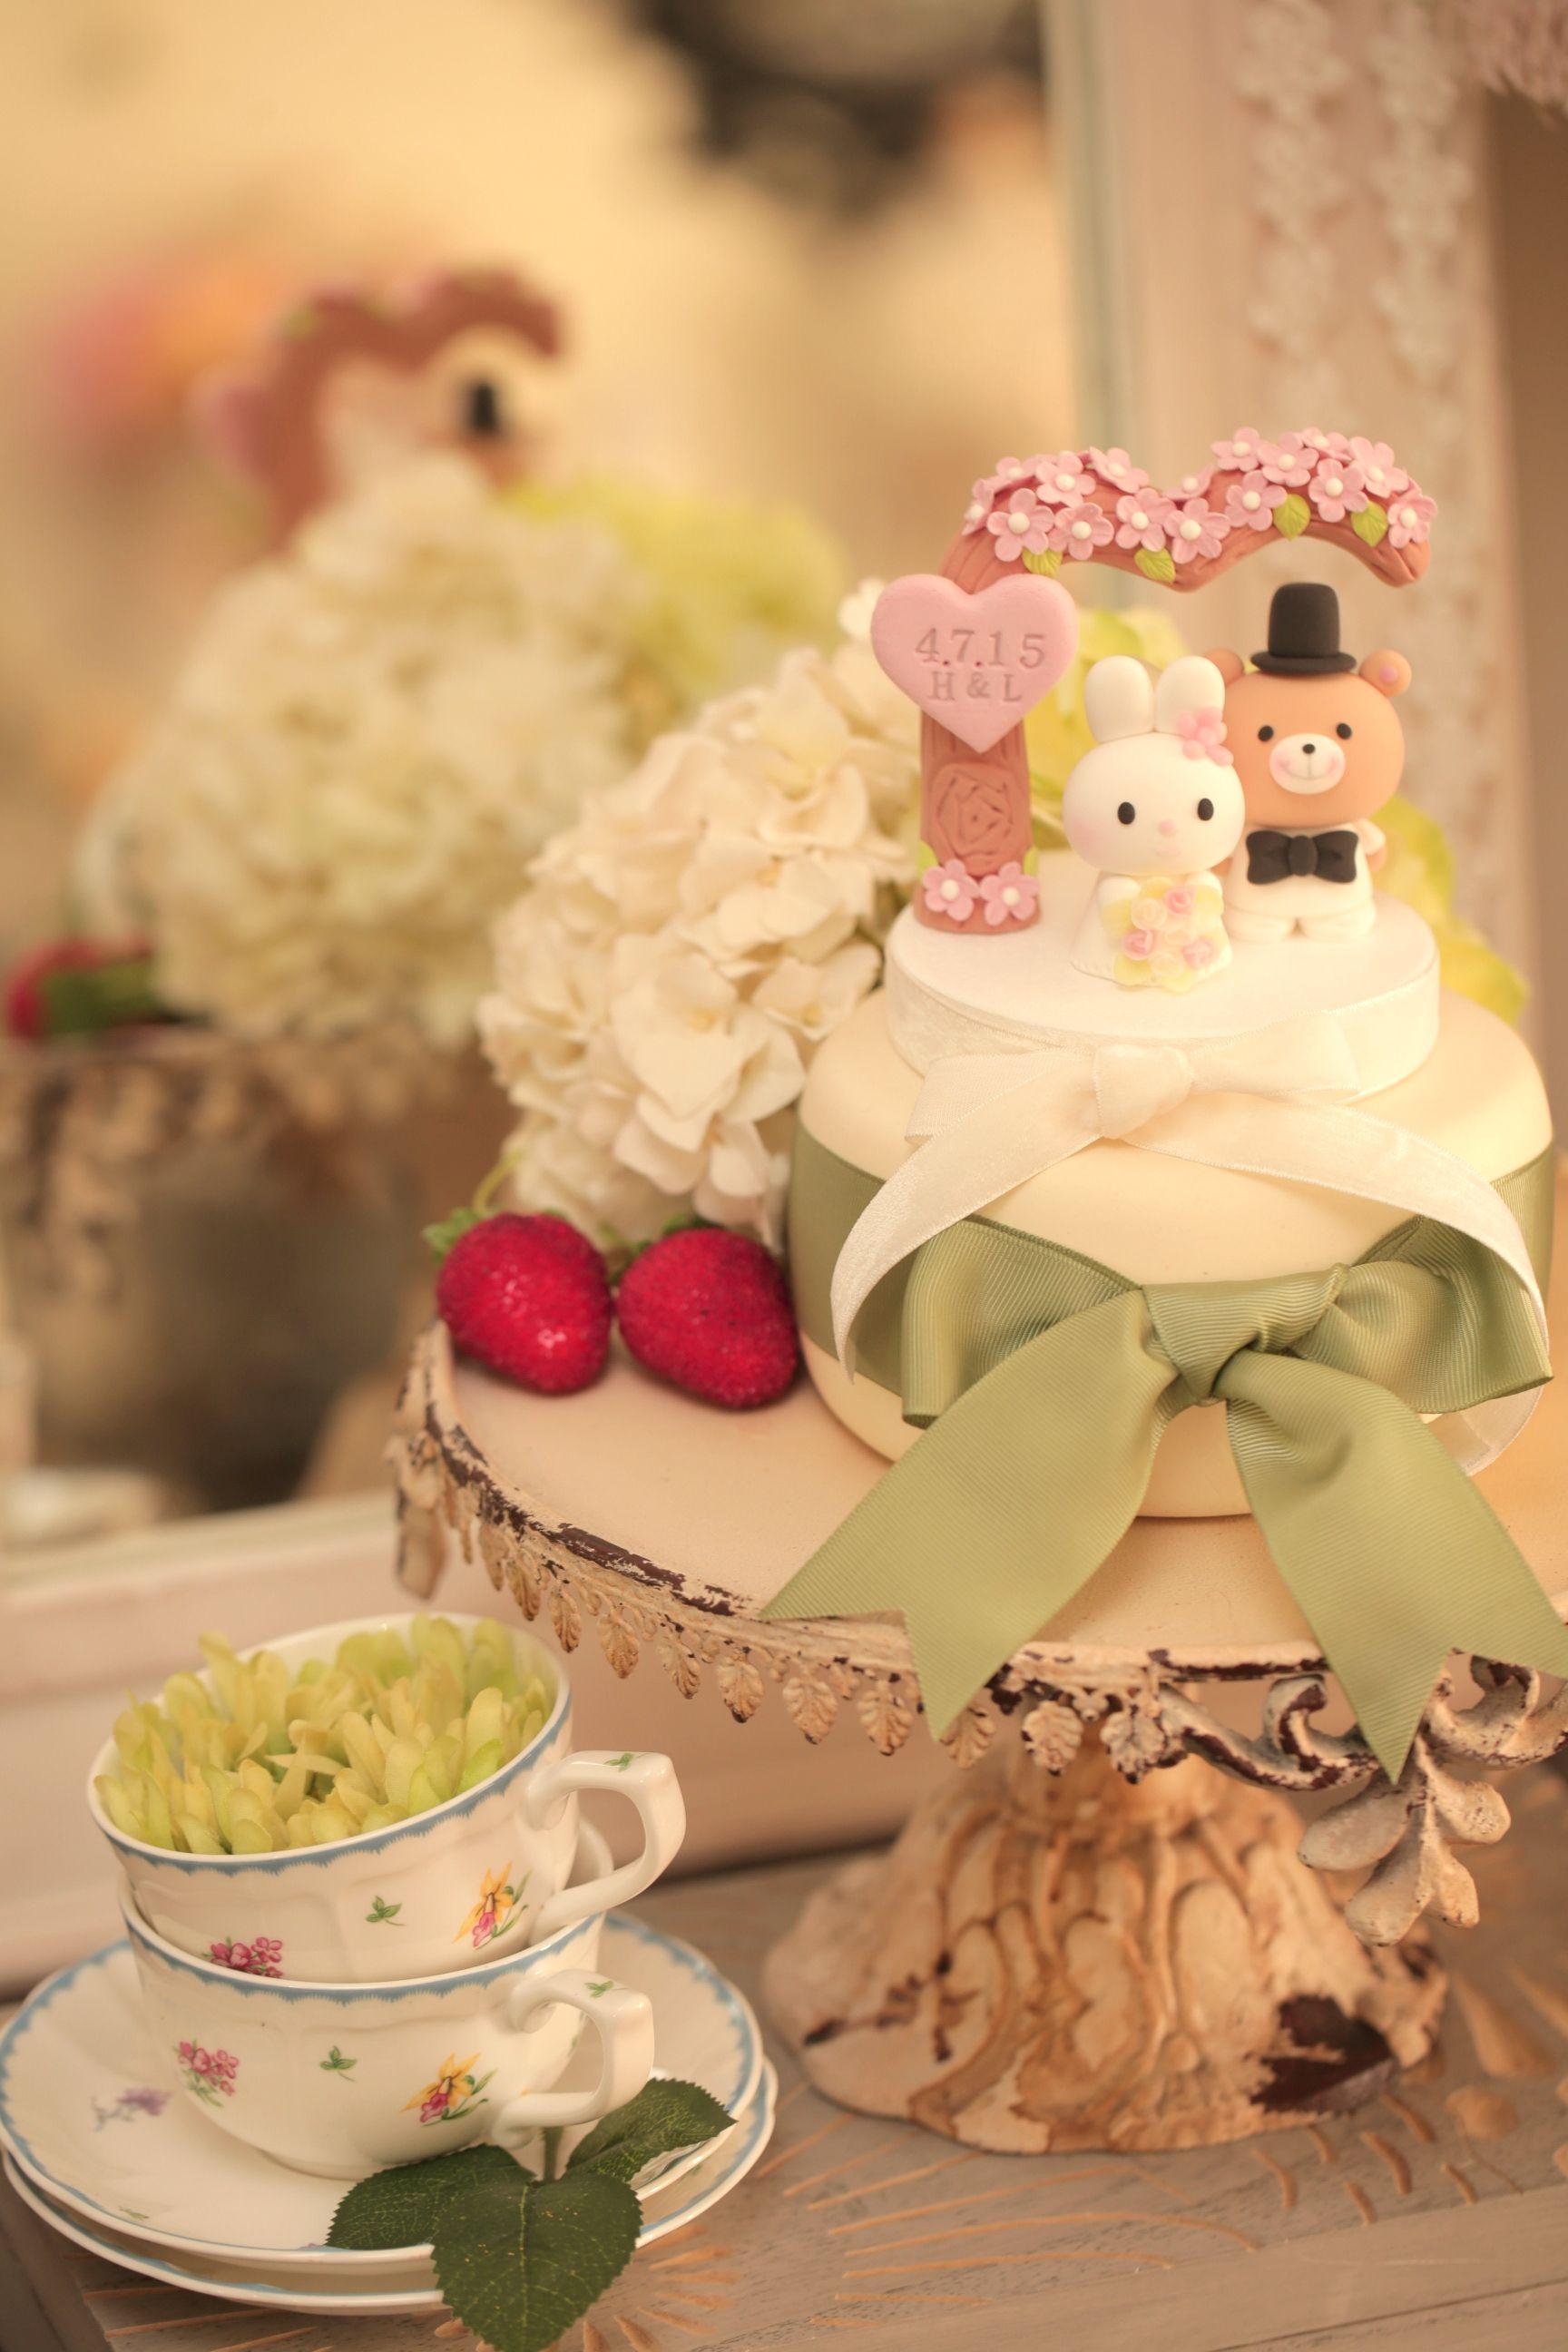 Rabbit and bear wedding cake topper---k963 | Pinterest | Rabbit ...